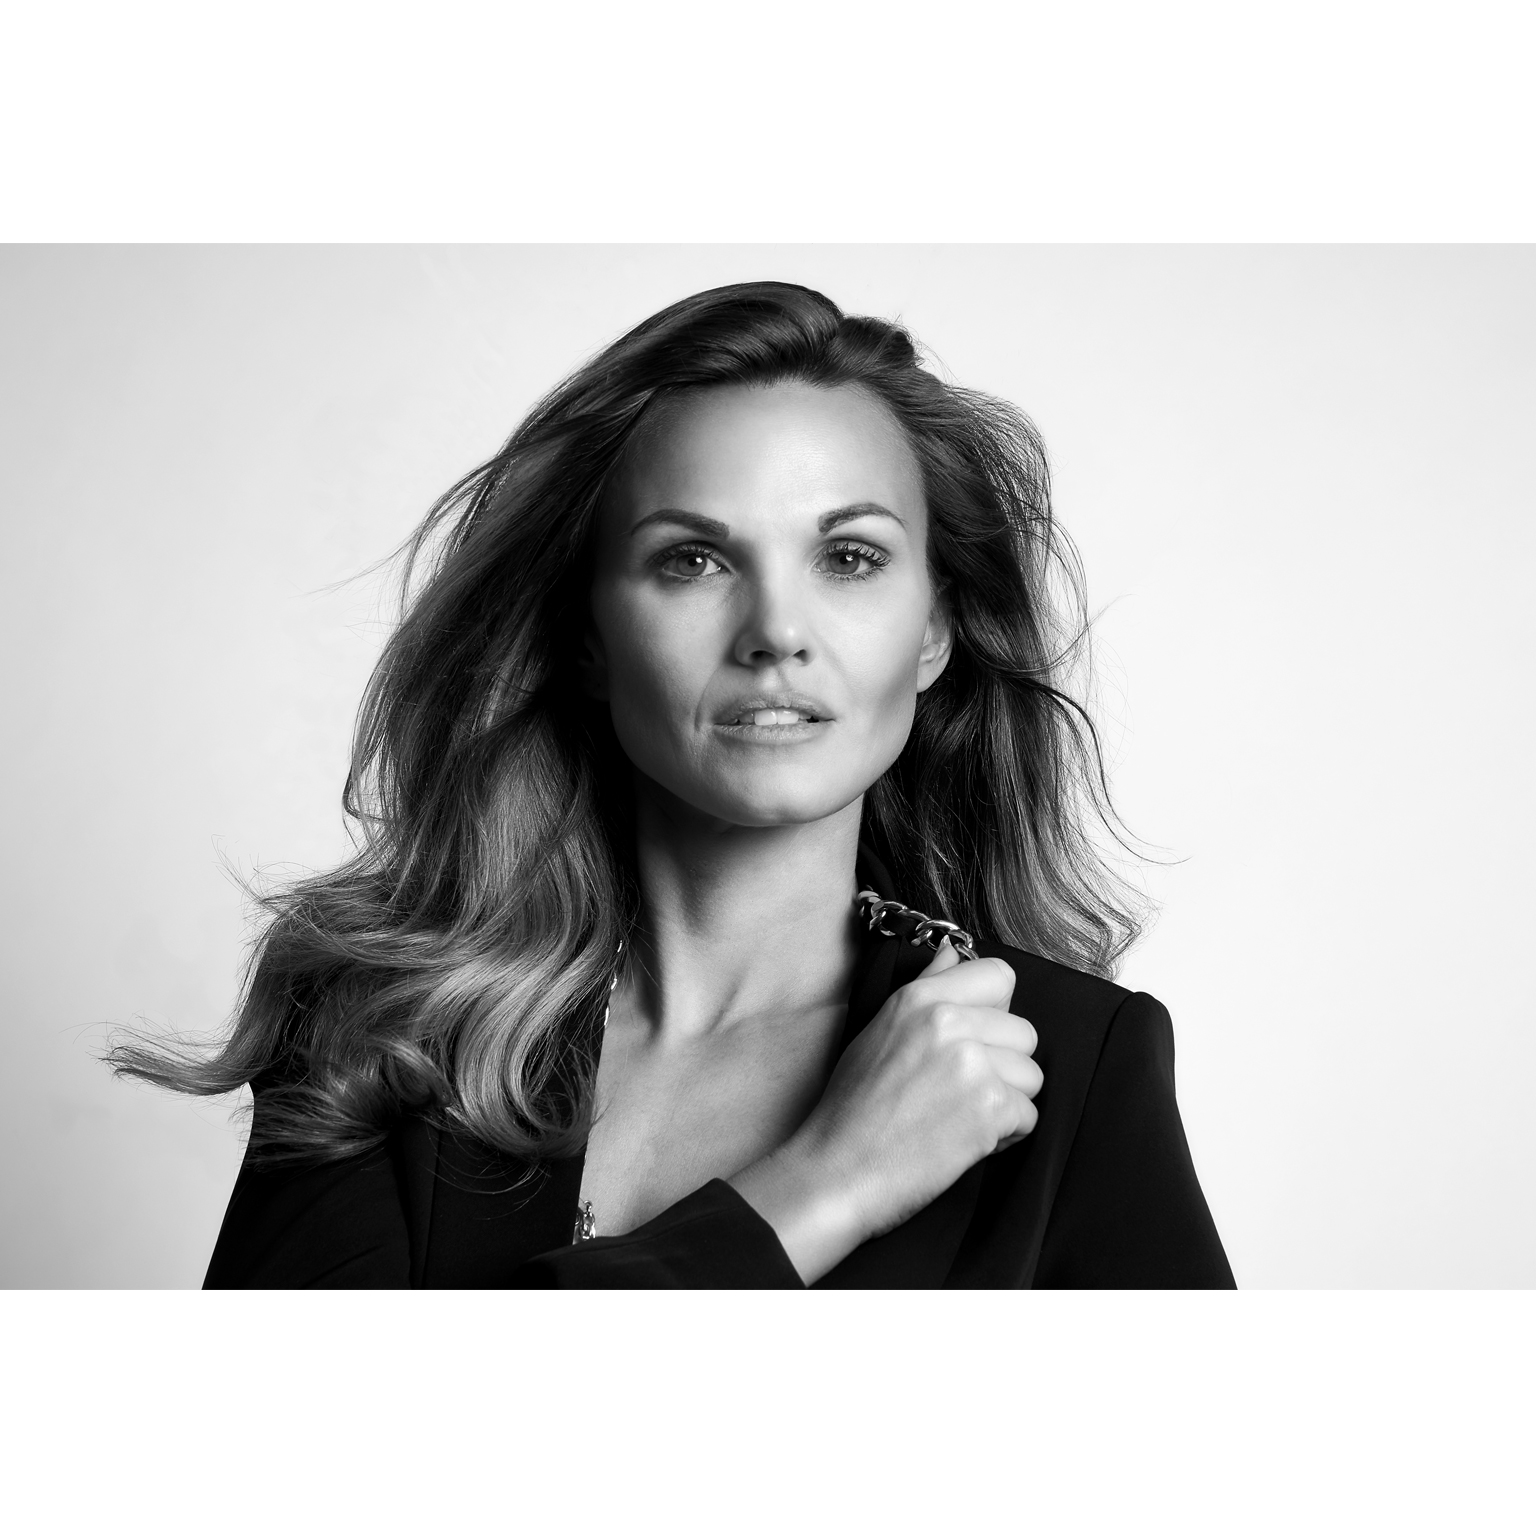 Toronto-Fitness-Model-Agency-Fashion-Beauty-Portrait-Megan-Schutte